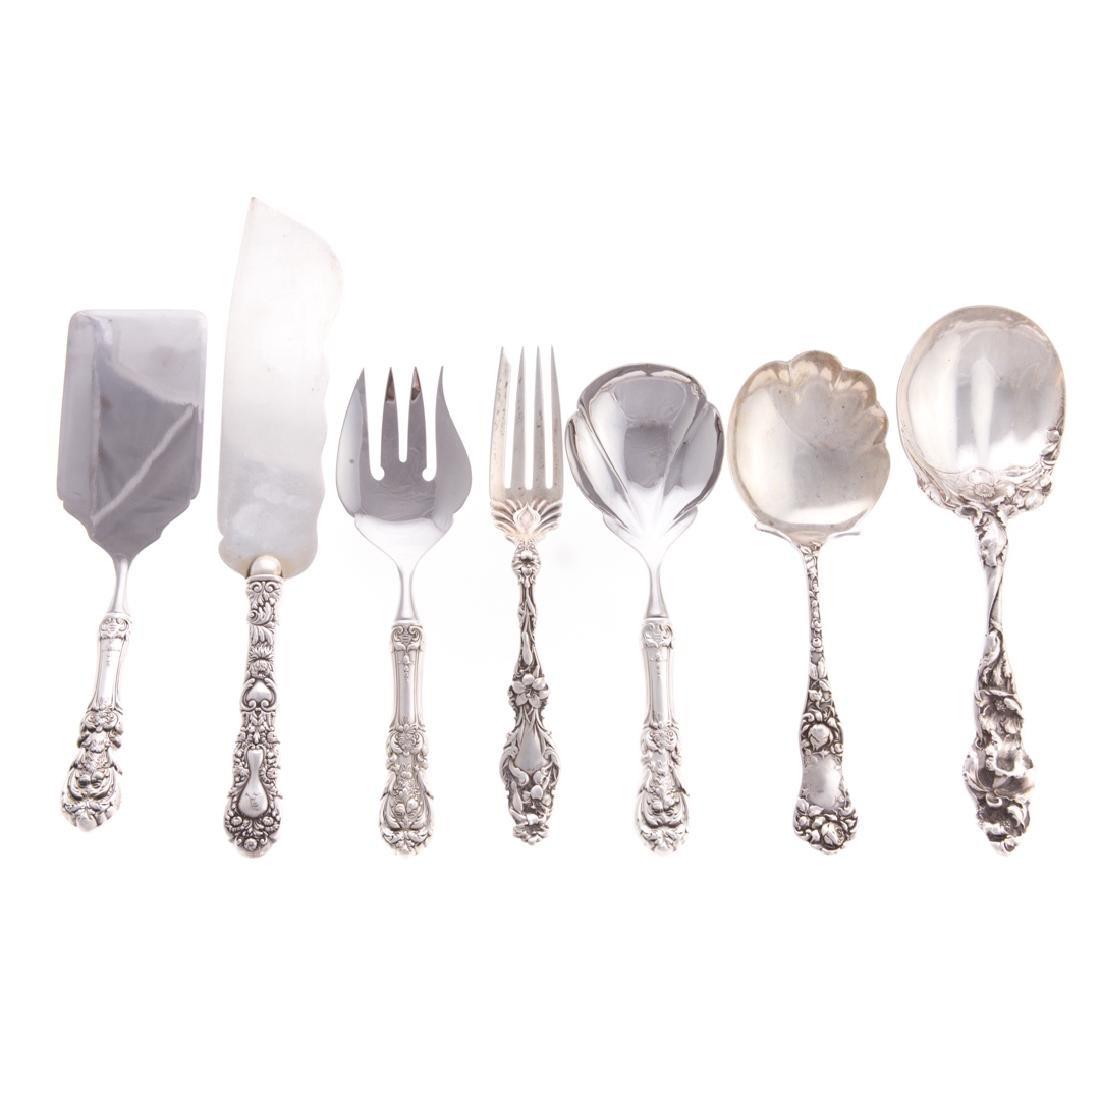 Seven American sterling flatware serving pieces